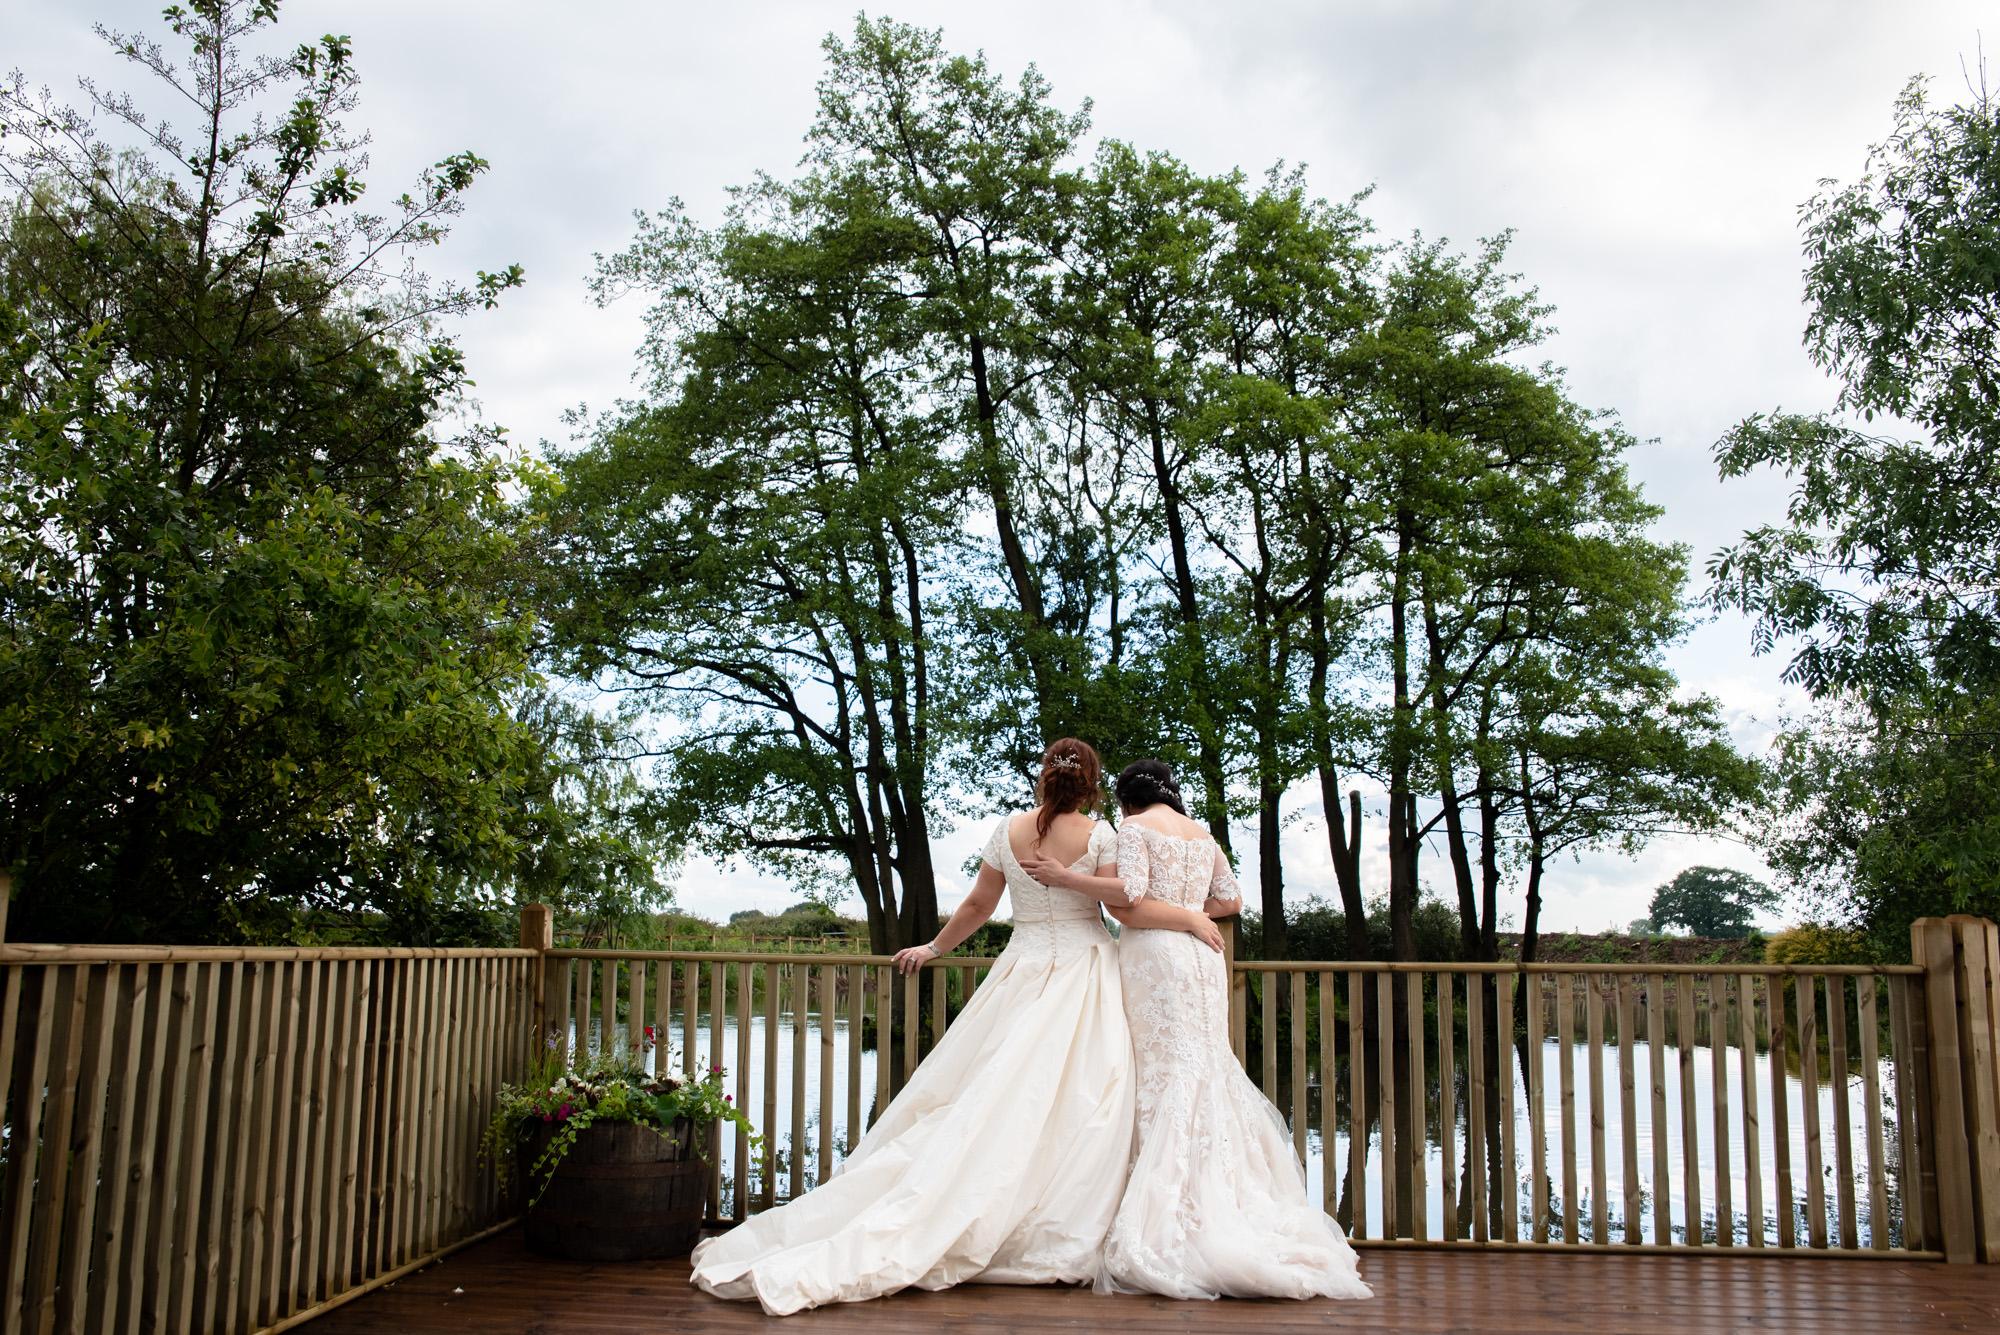 Two brides enjoying the lake view at Hanbury Wedding Barn